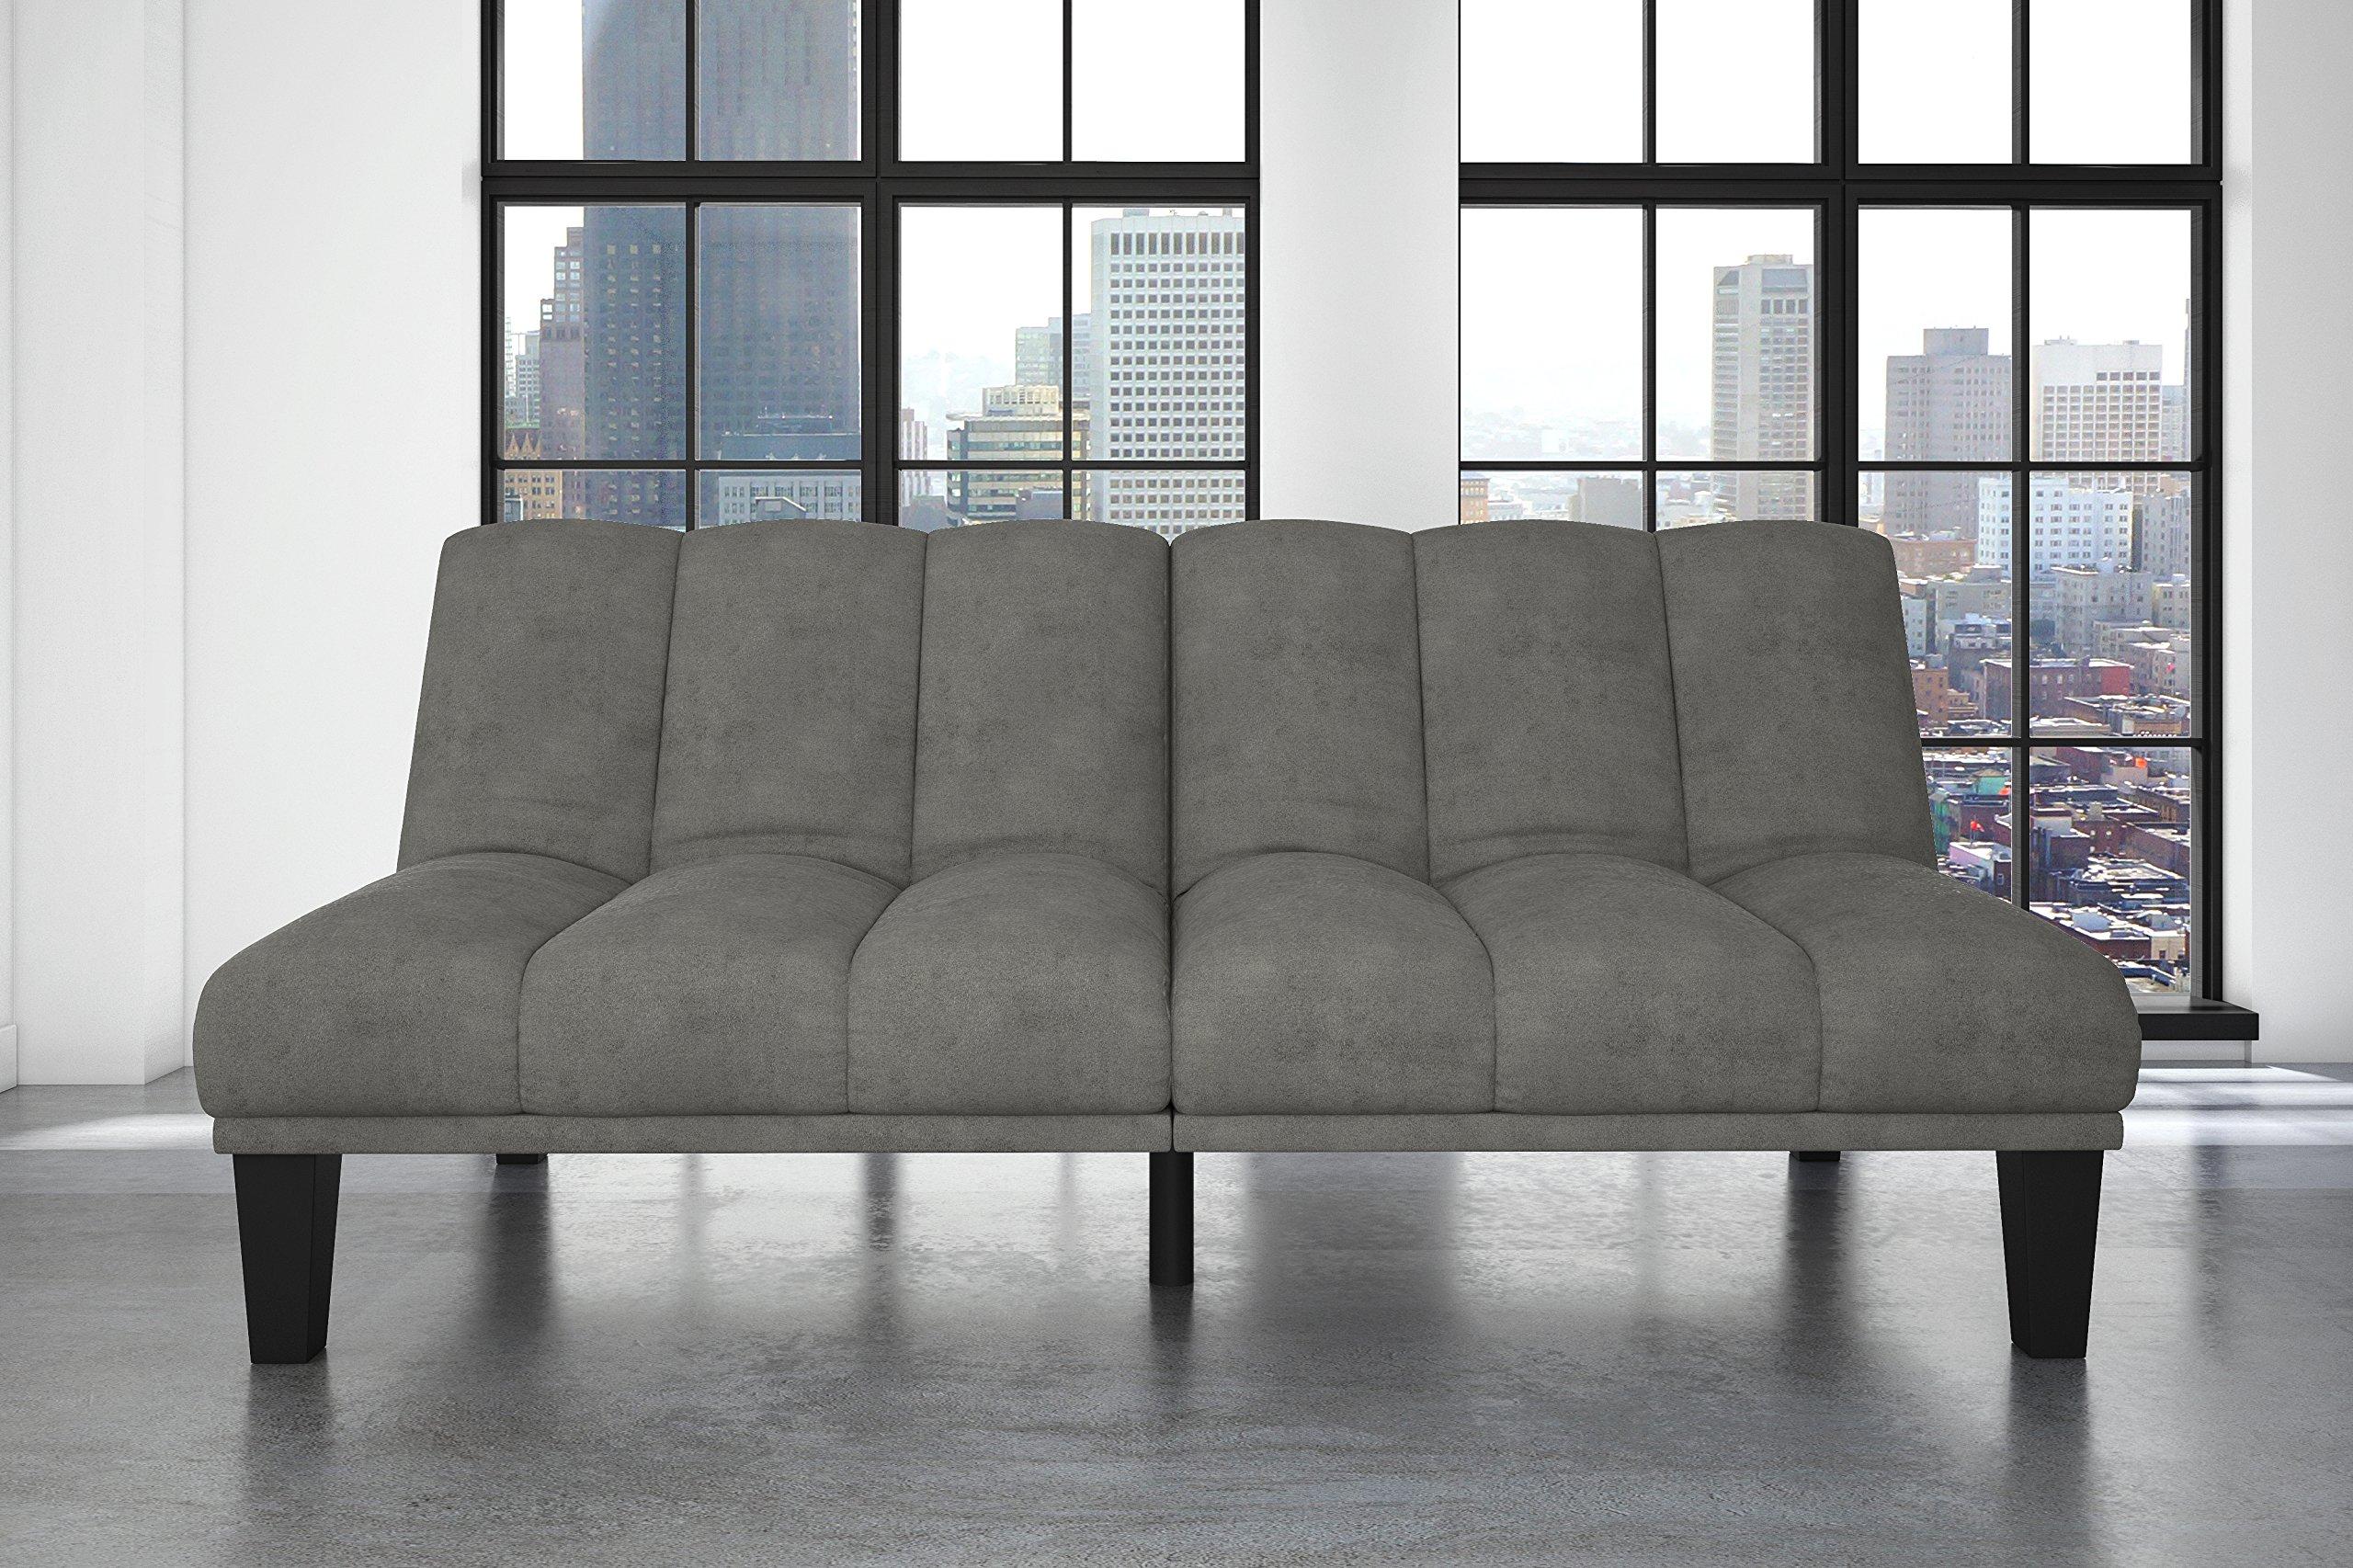 DHP Hamilton Estate Premium Sofa Futon Sleeper Comfortable Plush Upholstery, Rich Gray by DHP (Image #4)